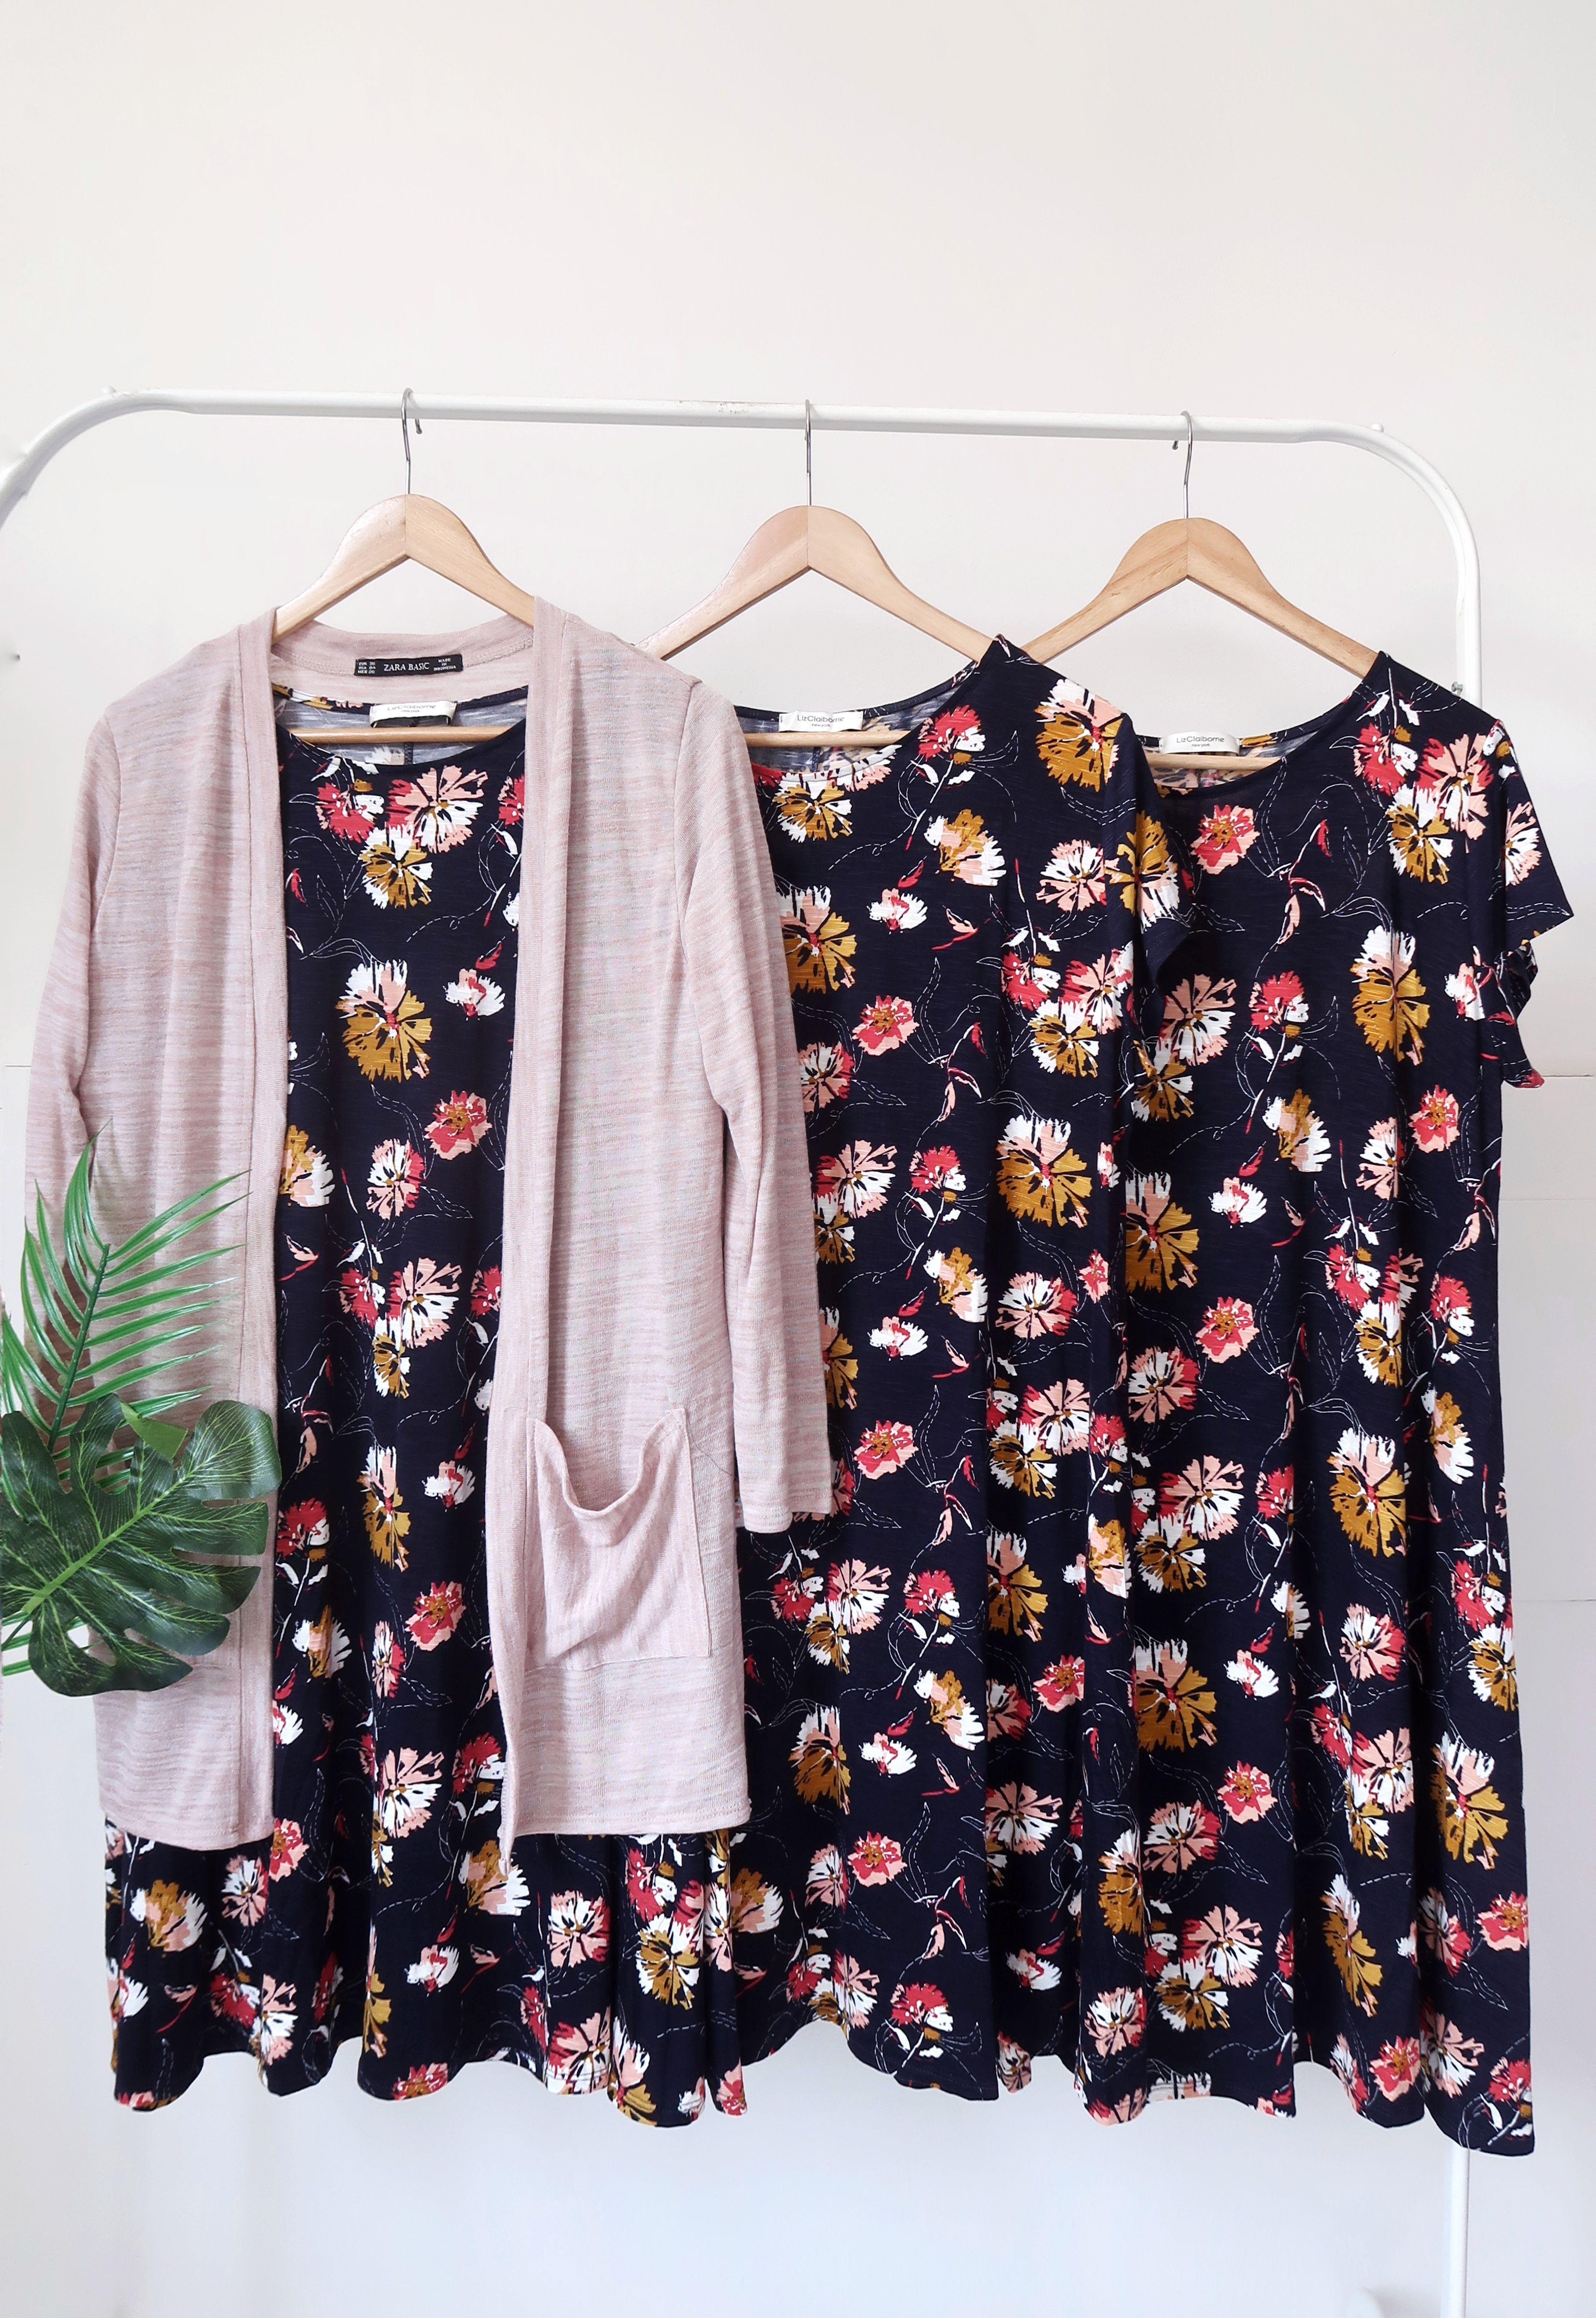 Grosir Baju Bandung